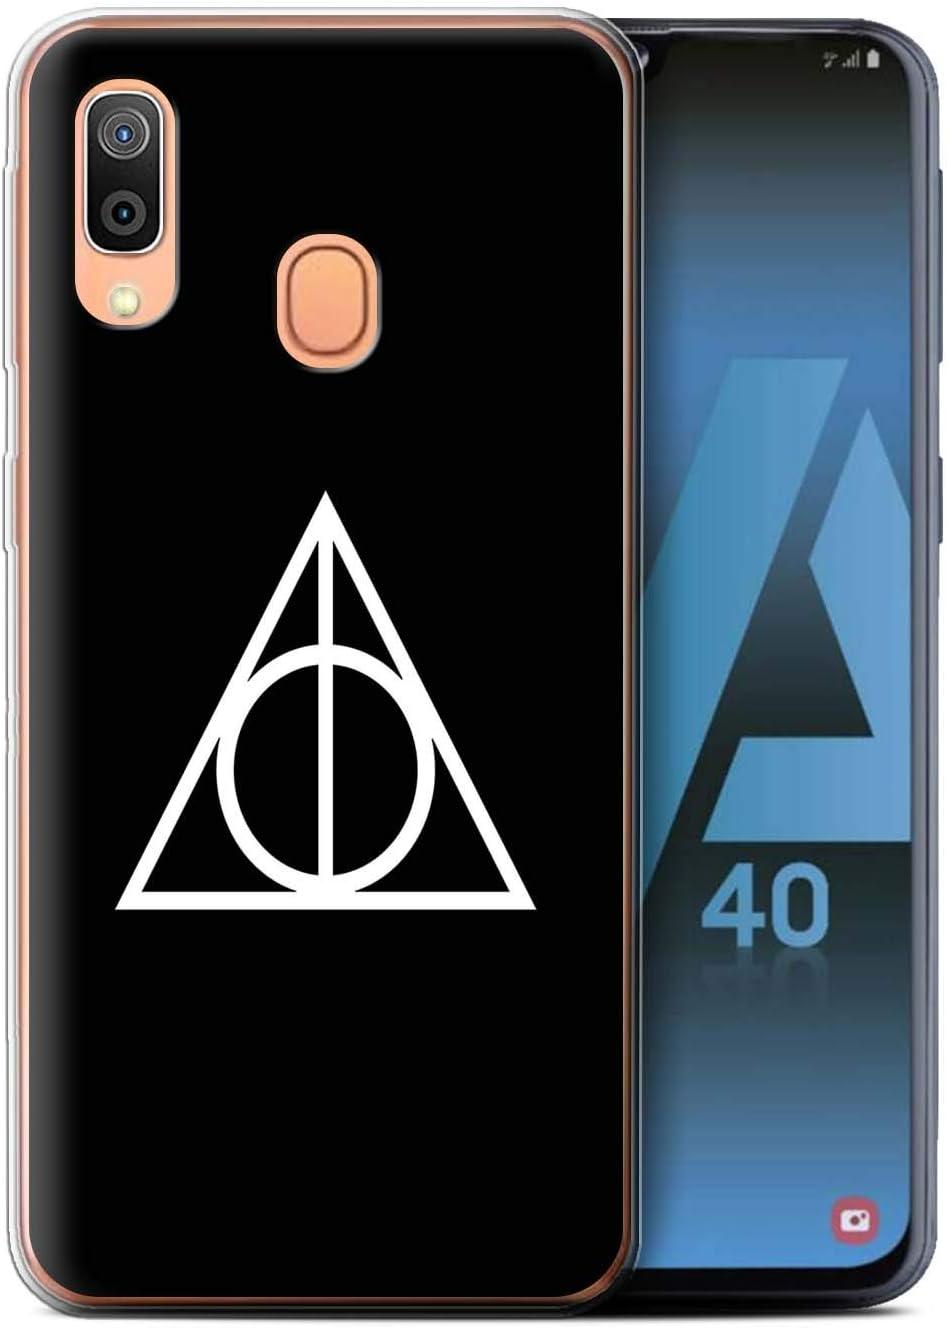 Officiel Harry Potter Personnages Deathly Hallows I Coque en Gel molle pour Samsung Galaxy J5 (2017)